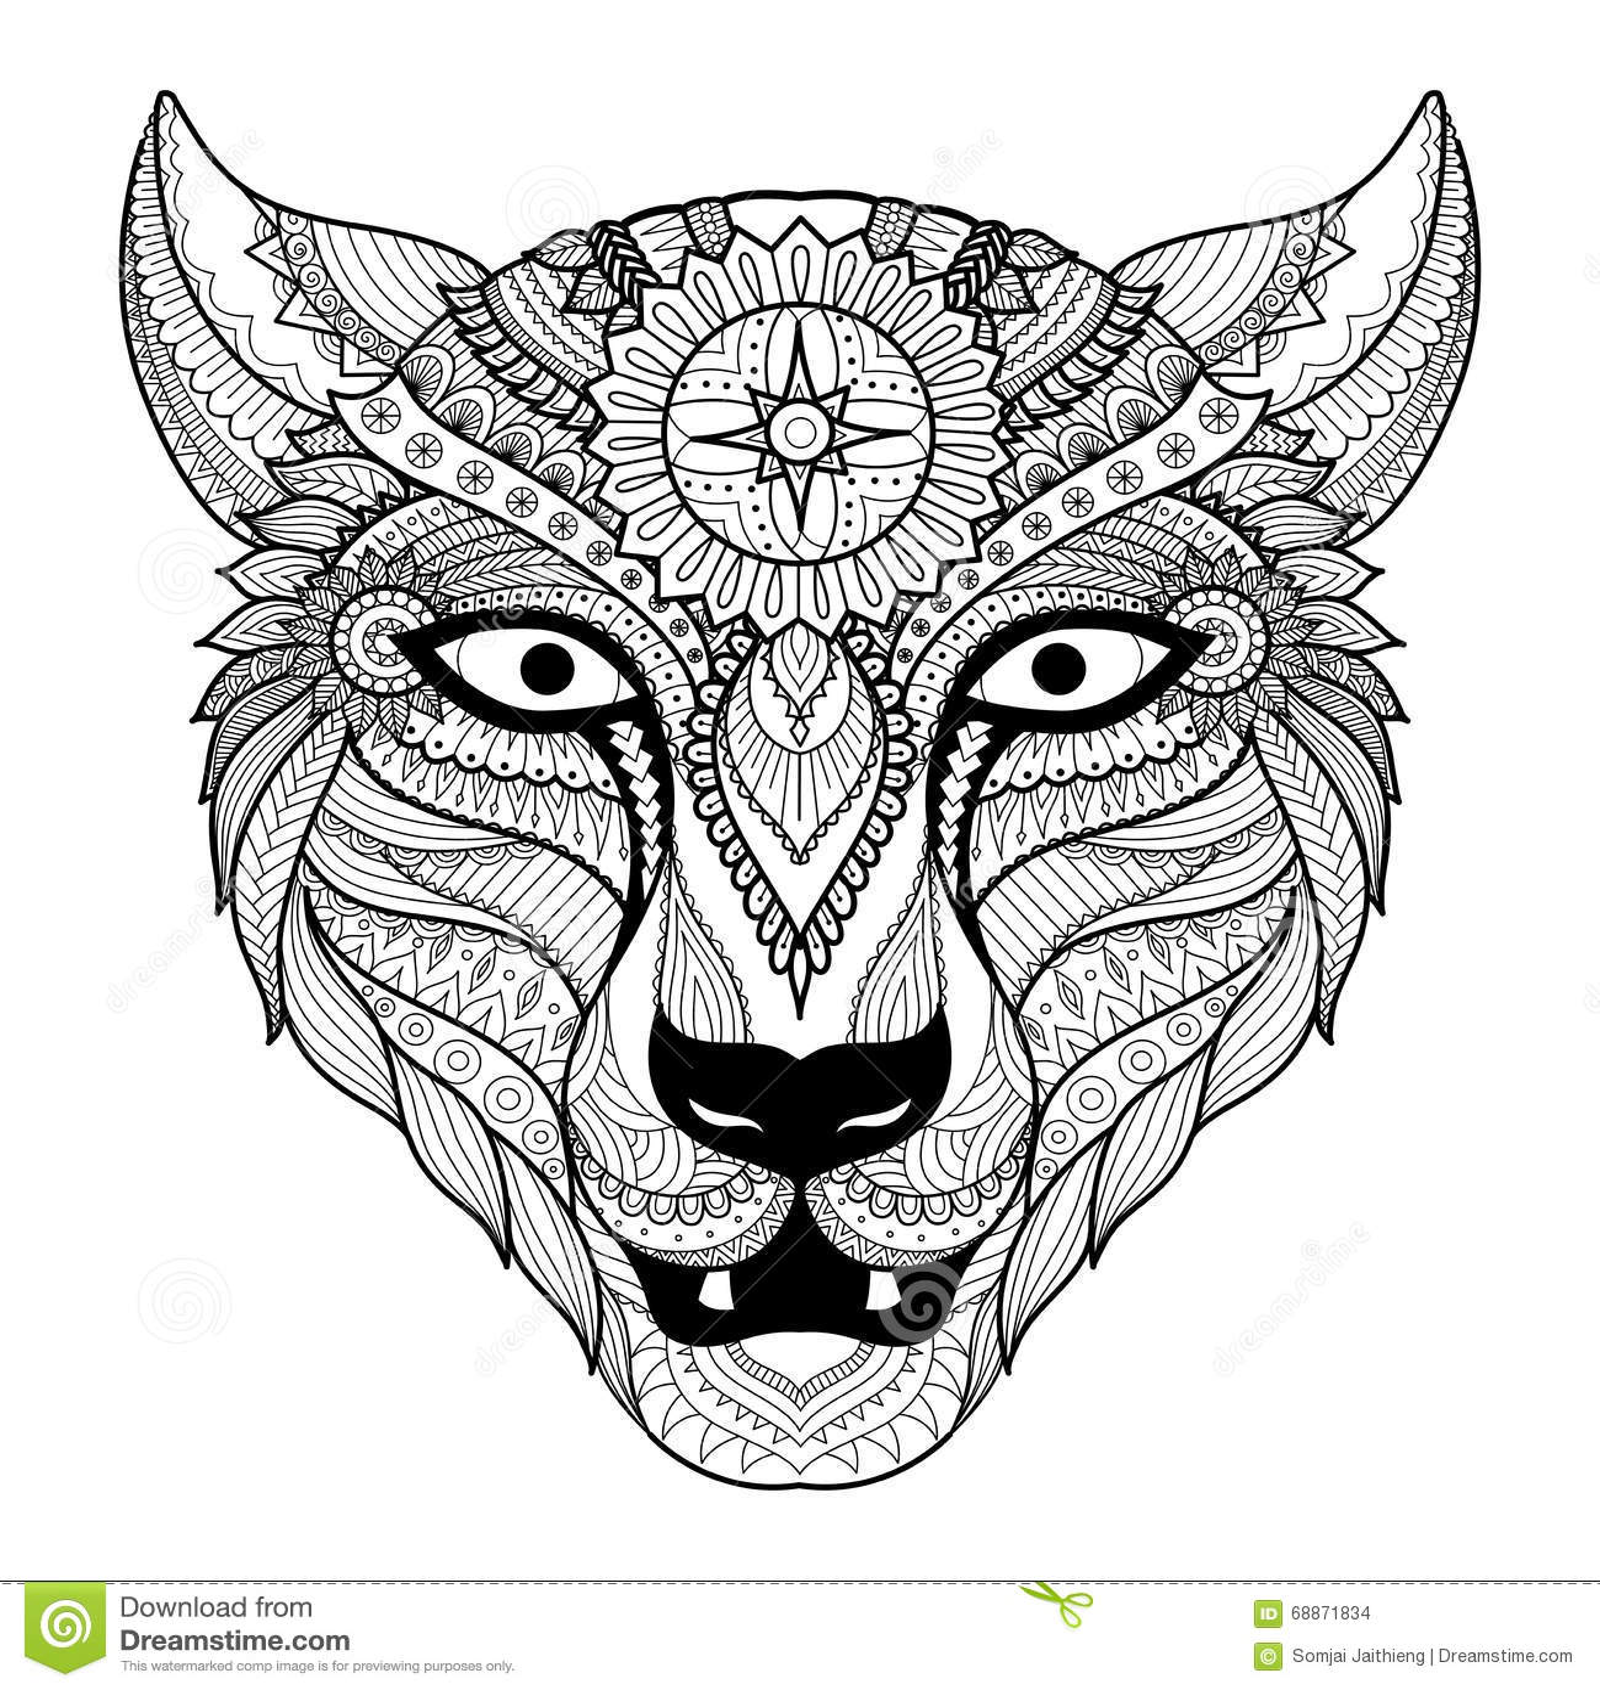 Leopard Line Art Design For Coloring Book For Adult